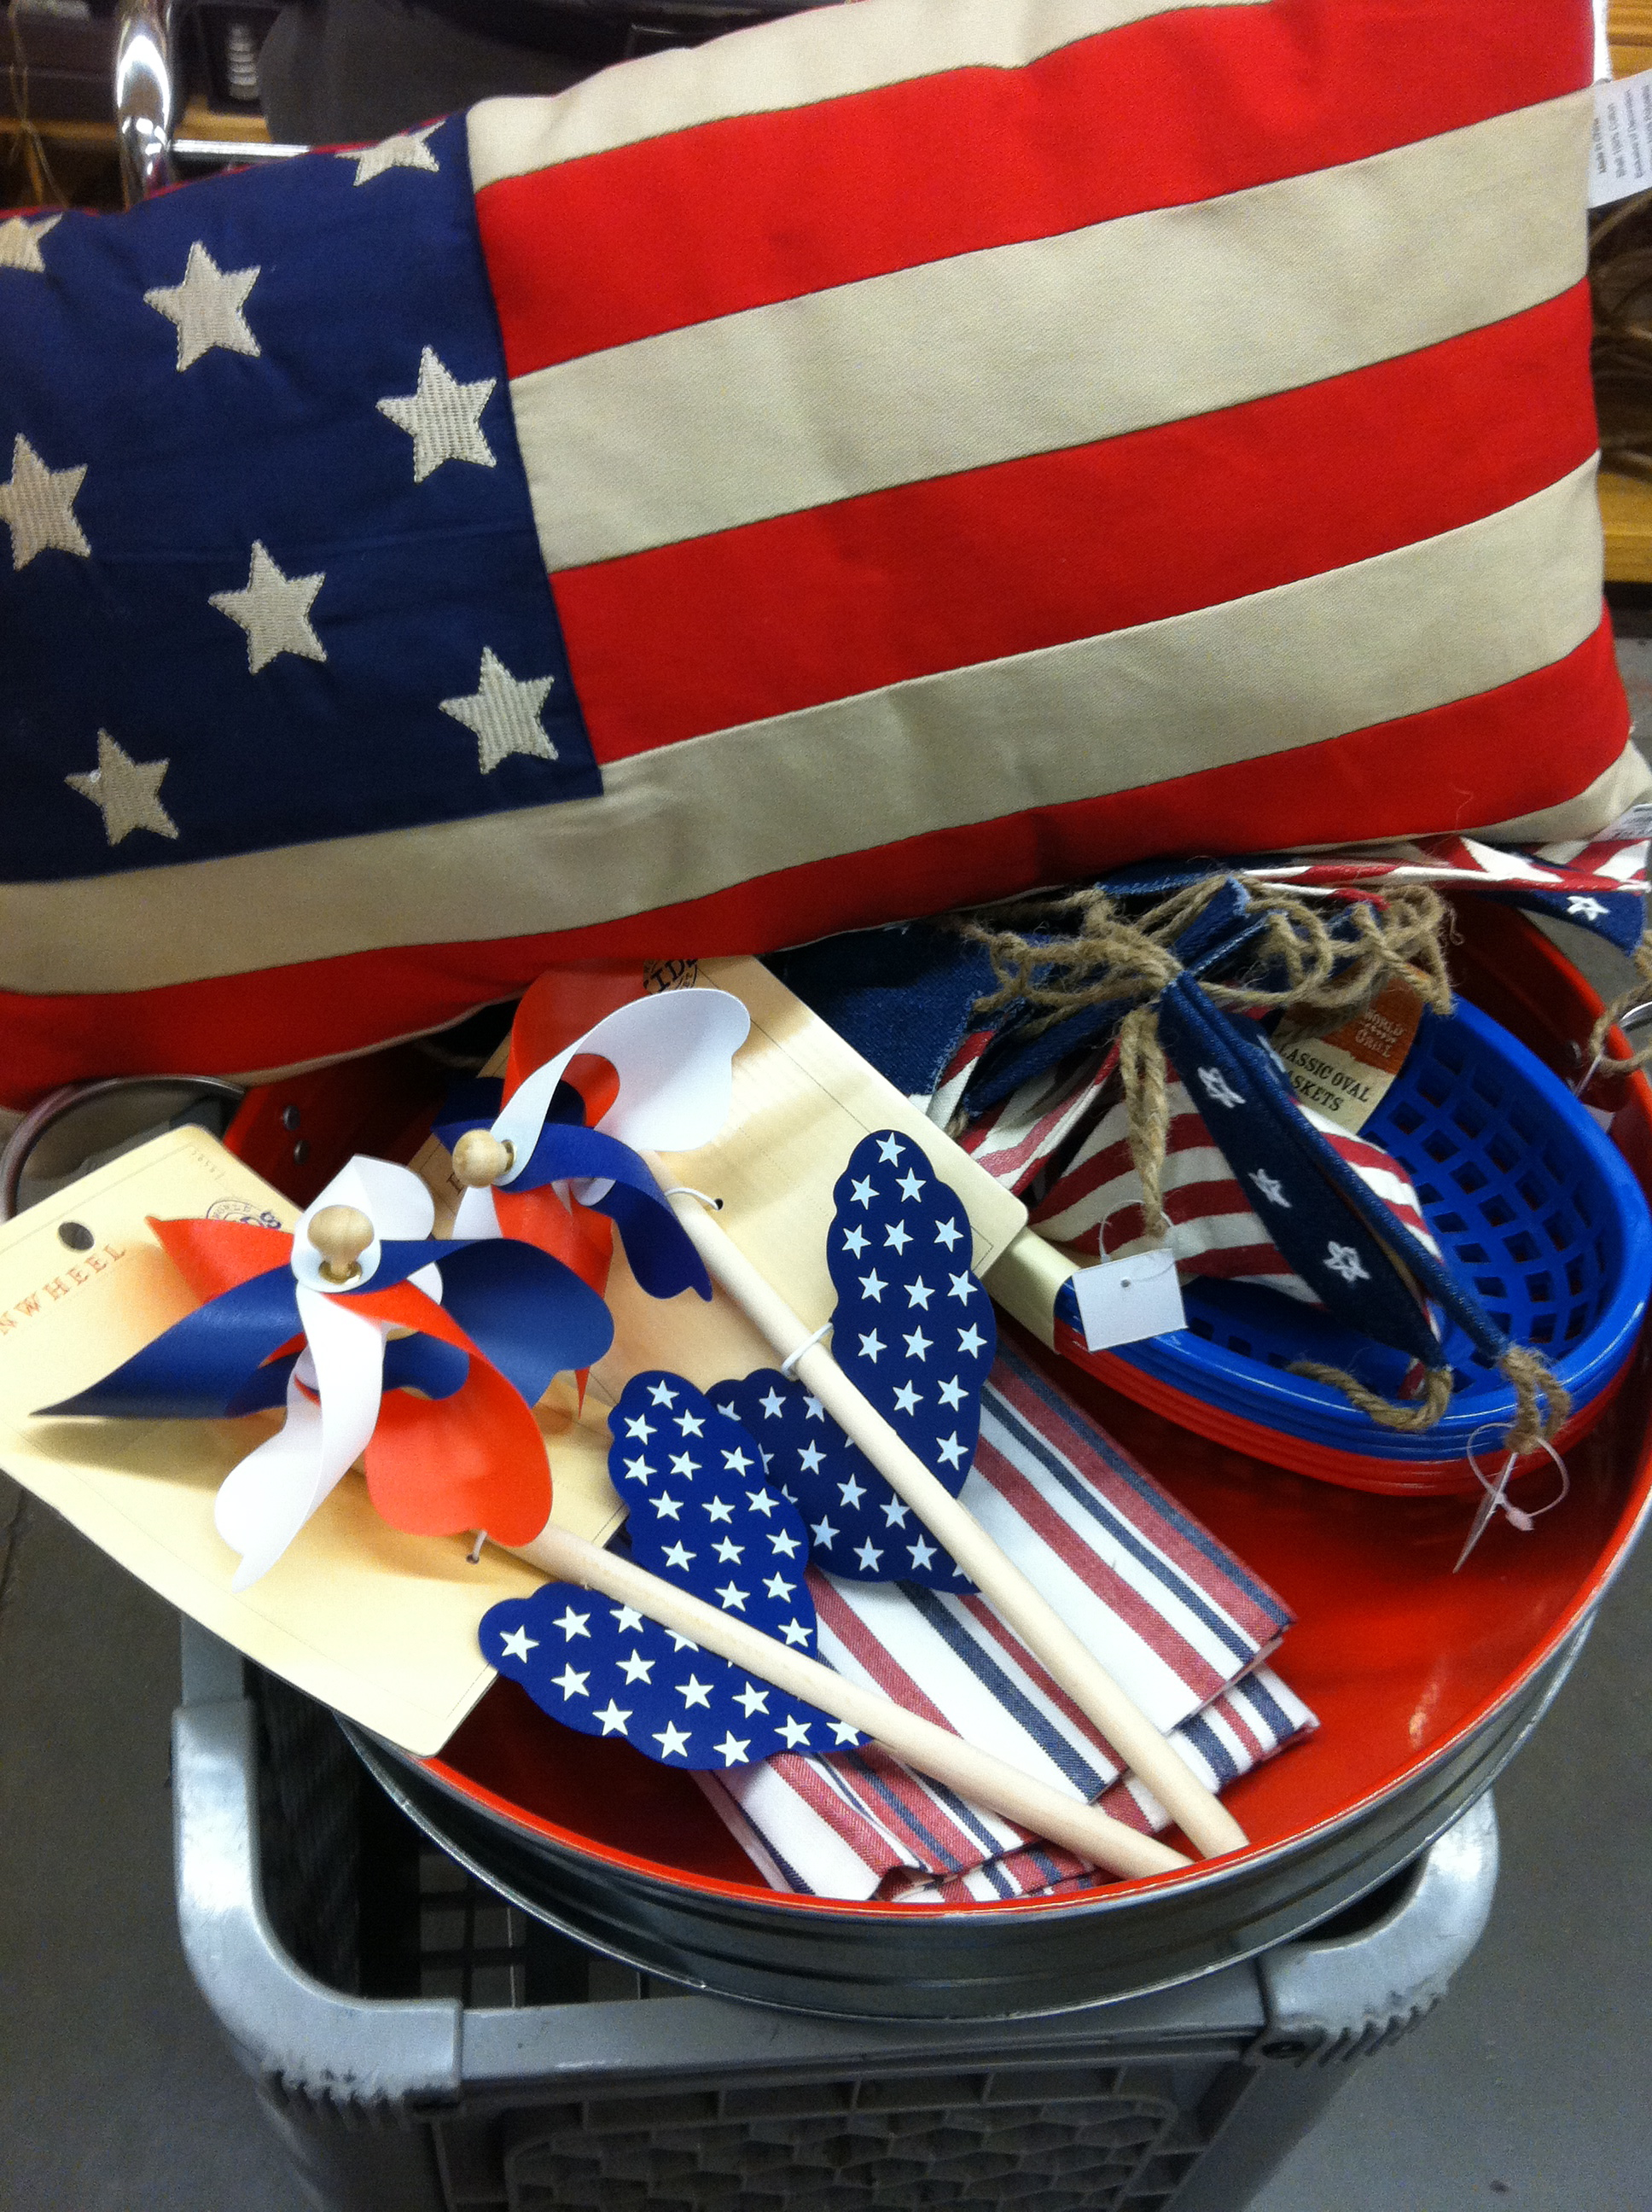 Getting Patriotic With Americana Decor